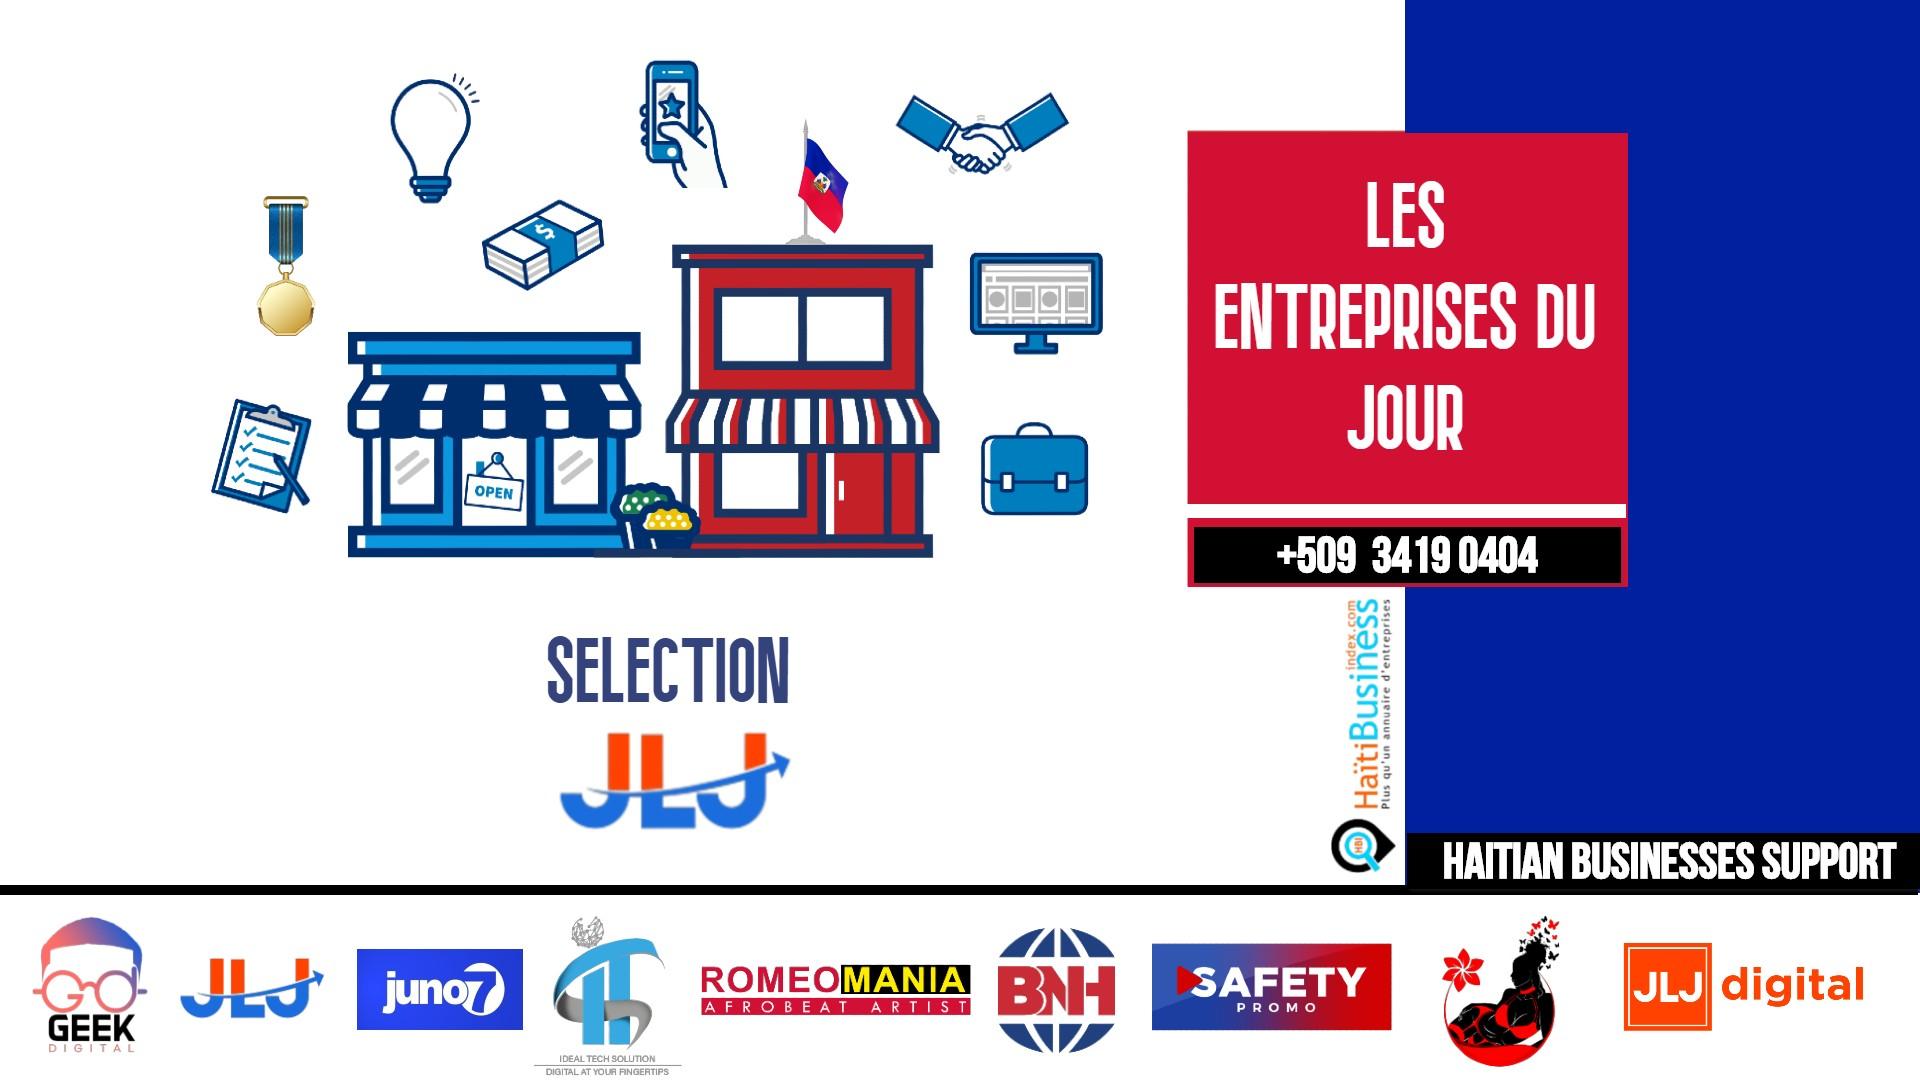 Choix JLJ du 10 Août 2020 - Abaka Bay Resort